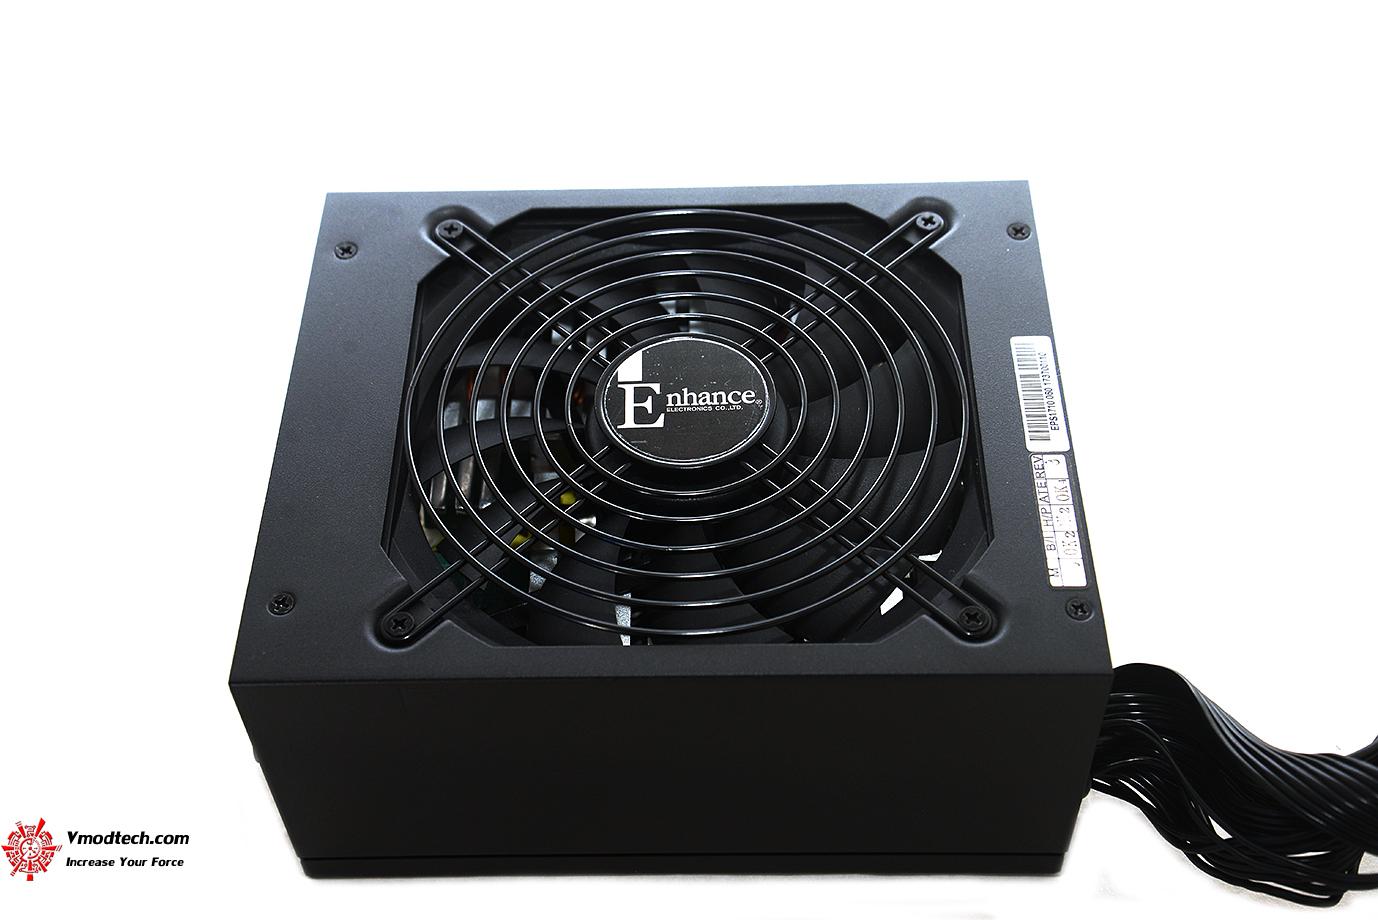 dsc 7013 ENHANCE POWER SUPPLY 1000W EPS 1710 GB1 REVIEW